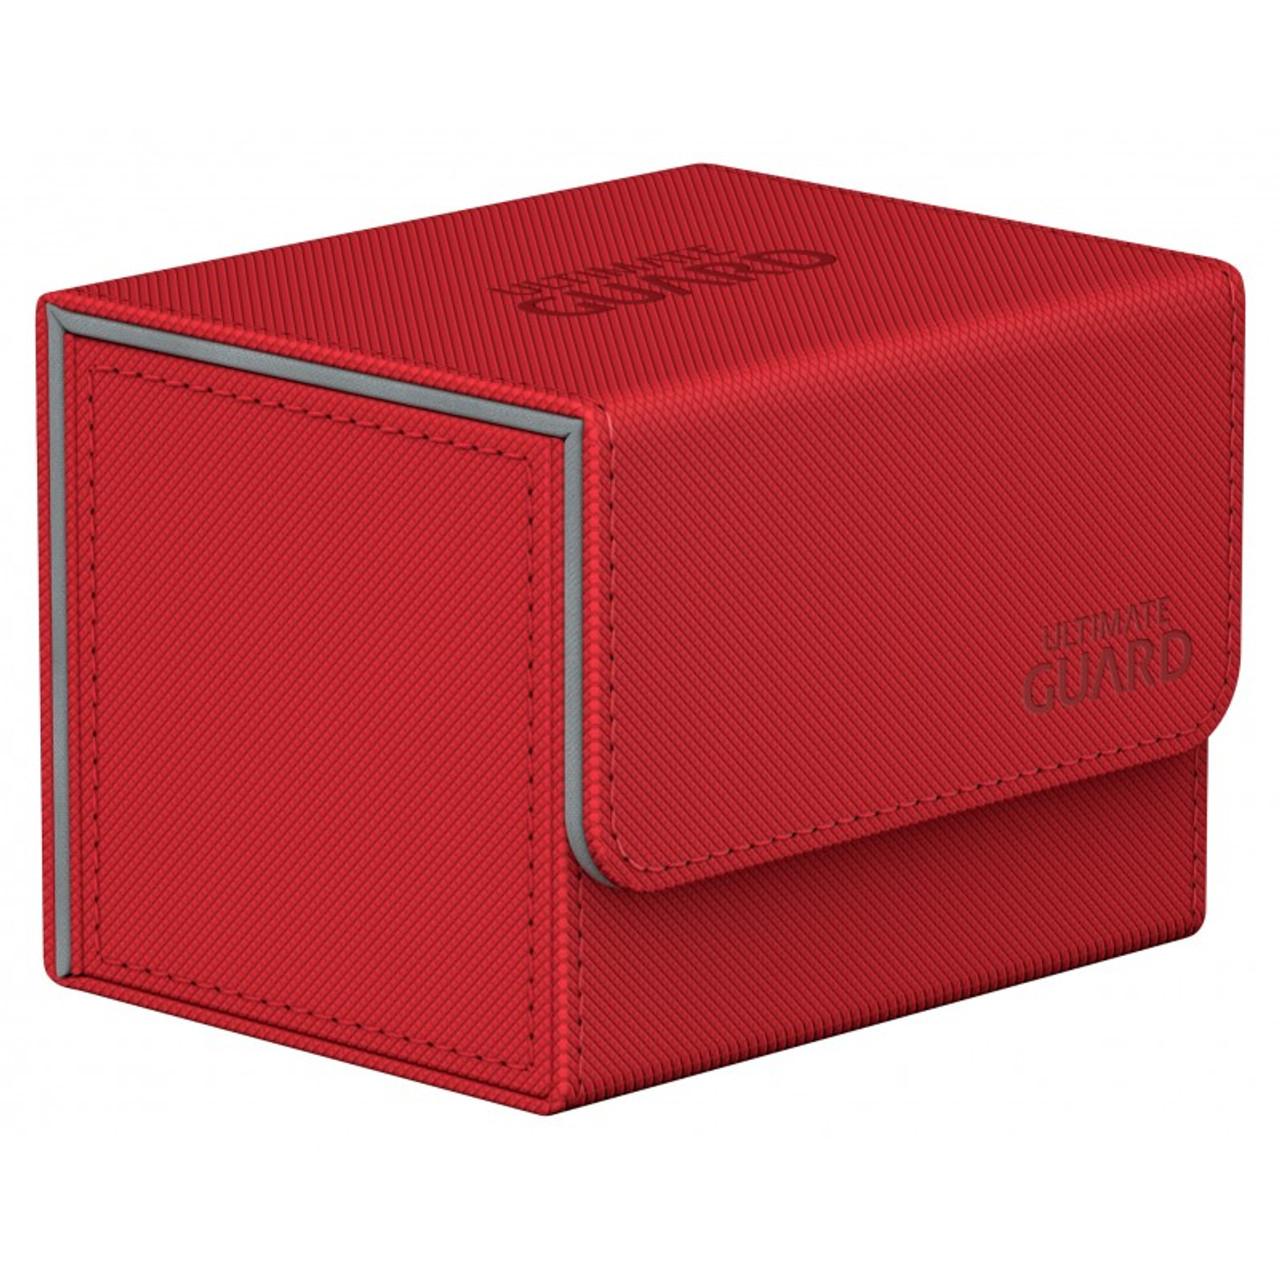 Ultimate Guard - Deck Box - Sidewinder XenoSkin Red - 100+